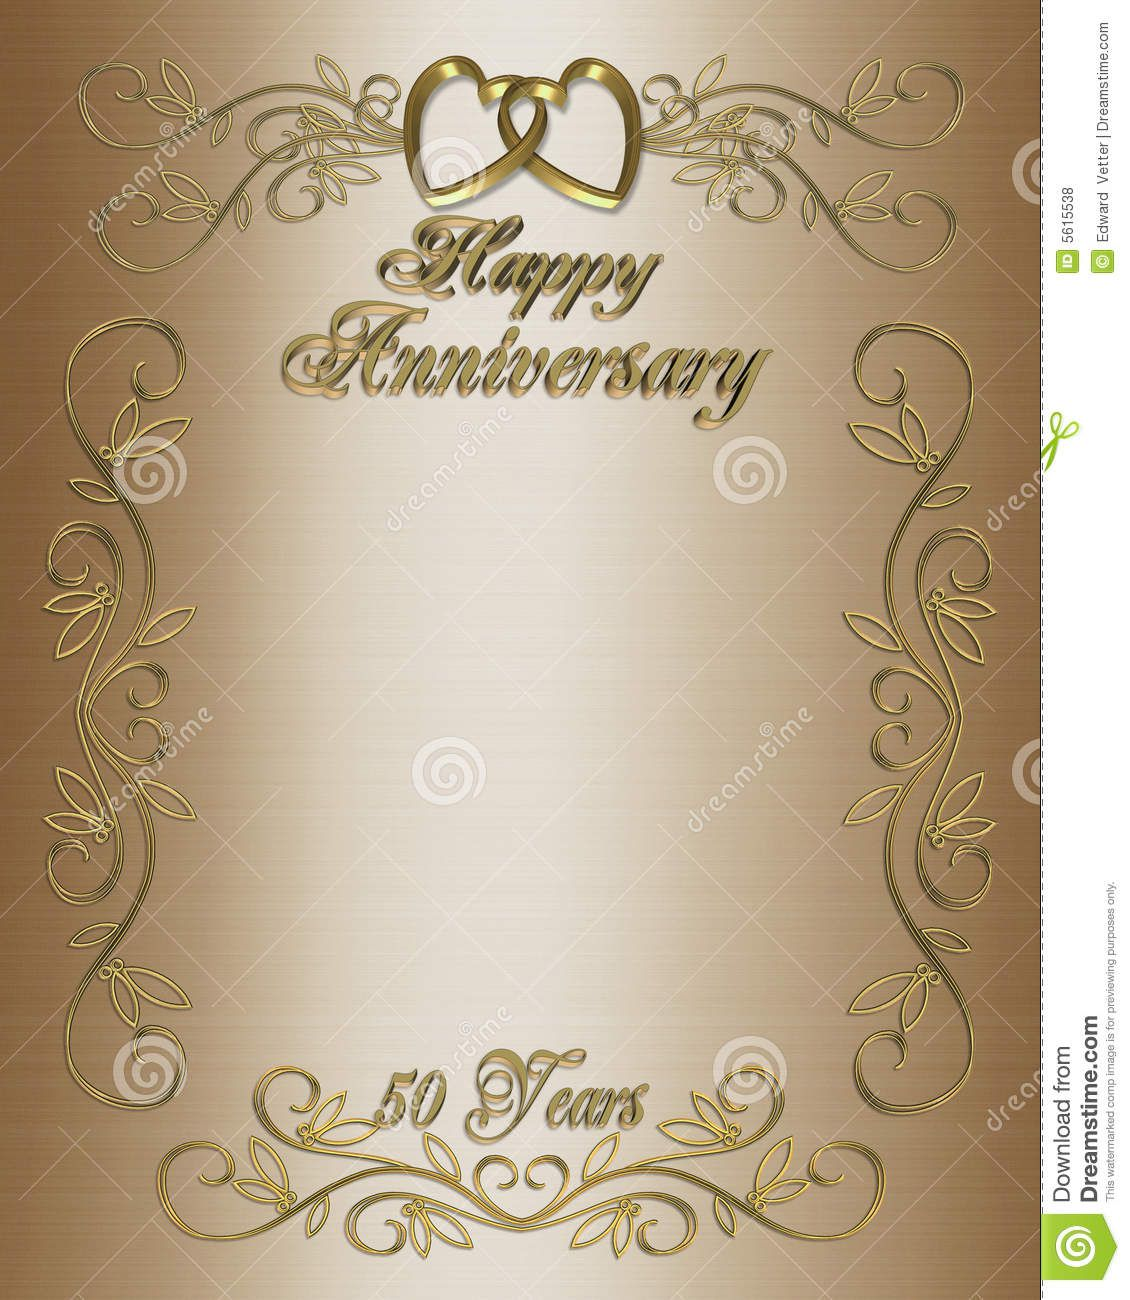 001 Astounding 50th Wedding Anniversary Invitation Design Inspiration  Designs Wording Sample Card Template Free DownloadFull